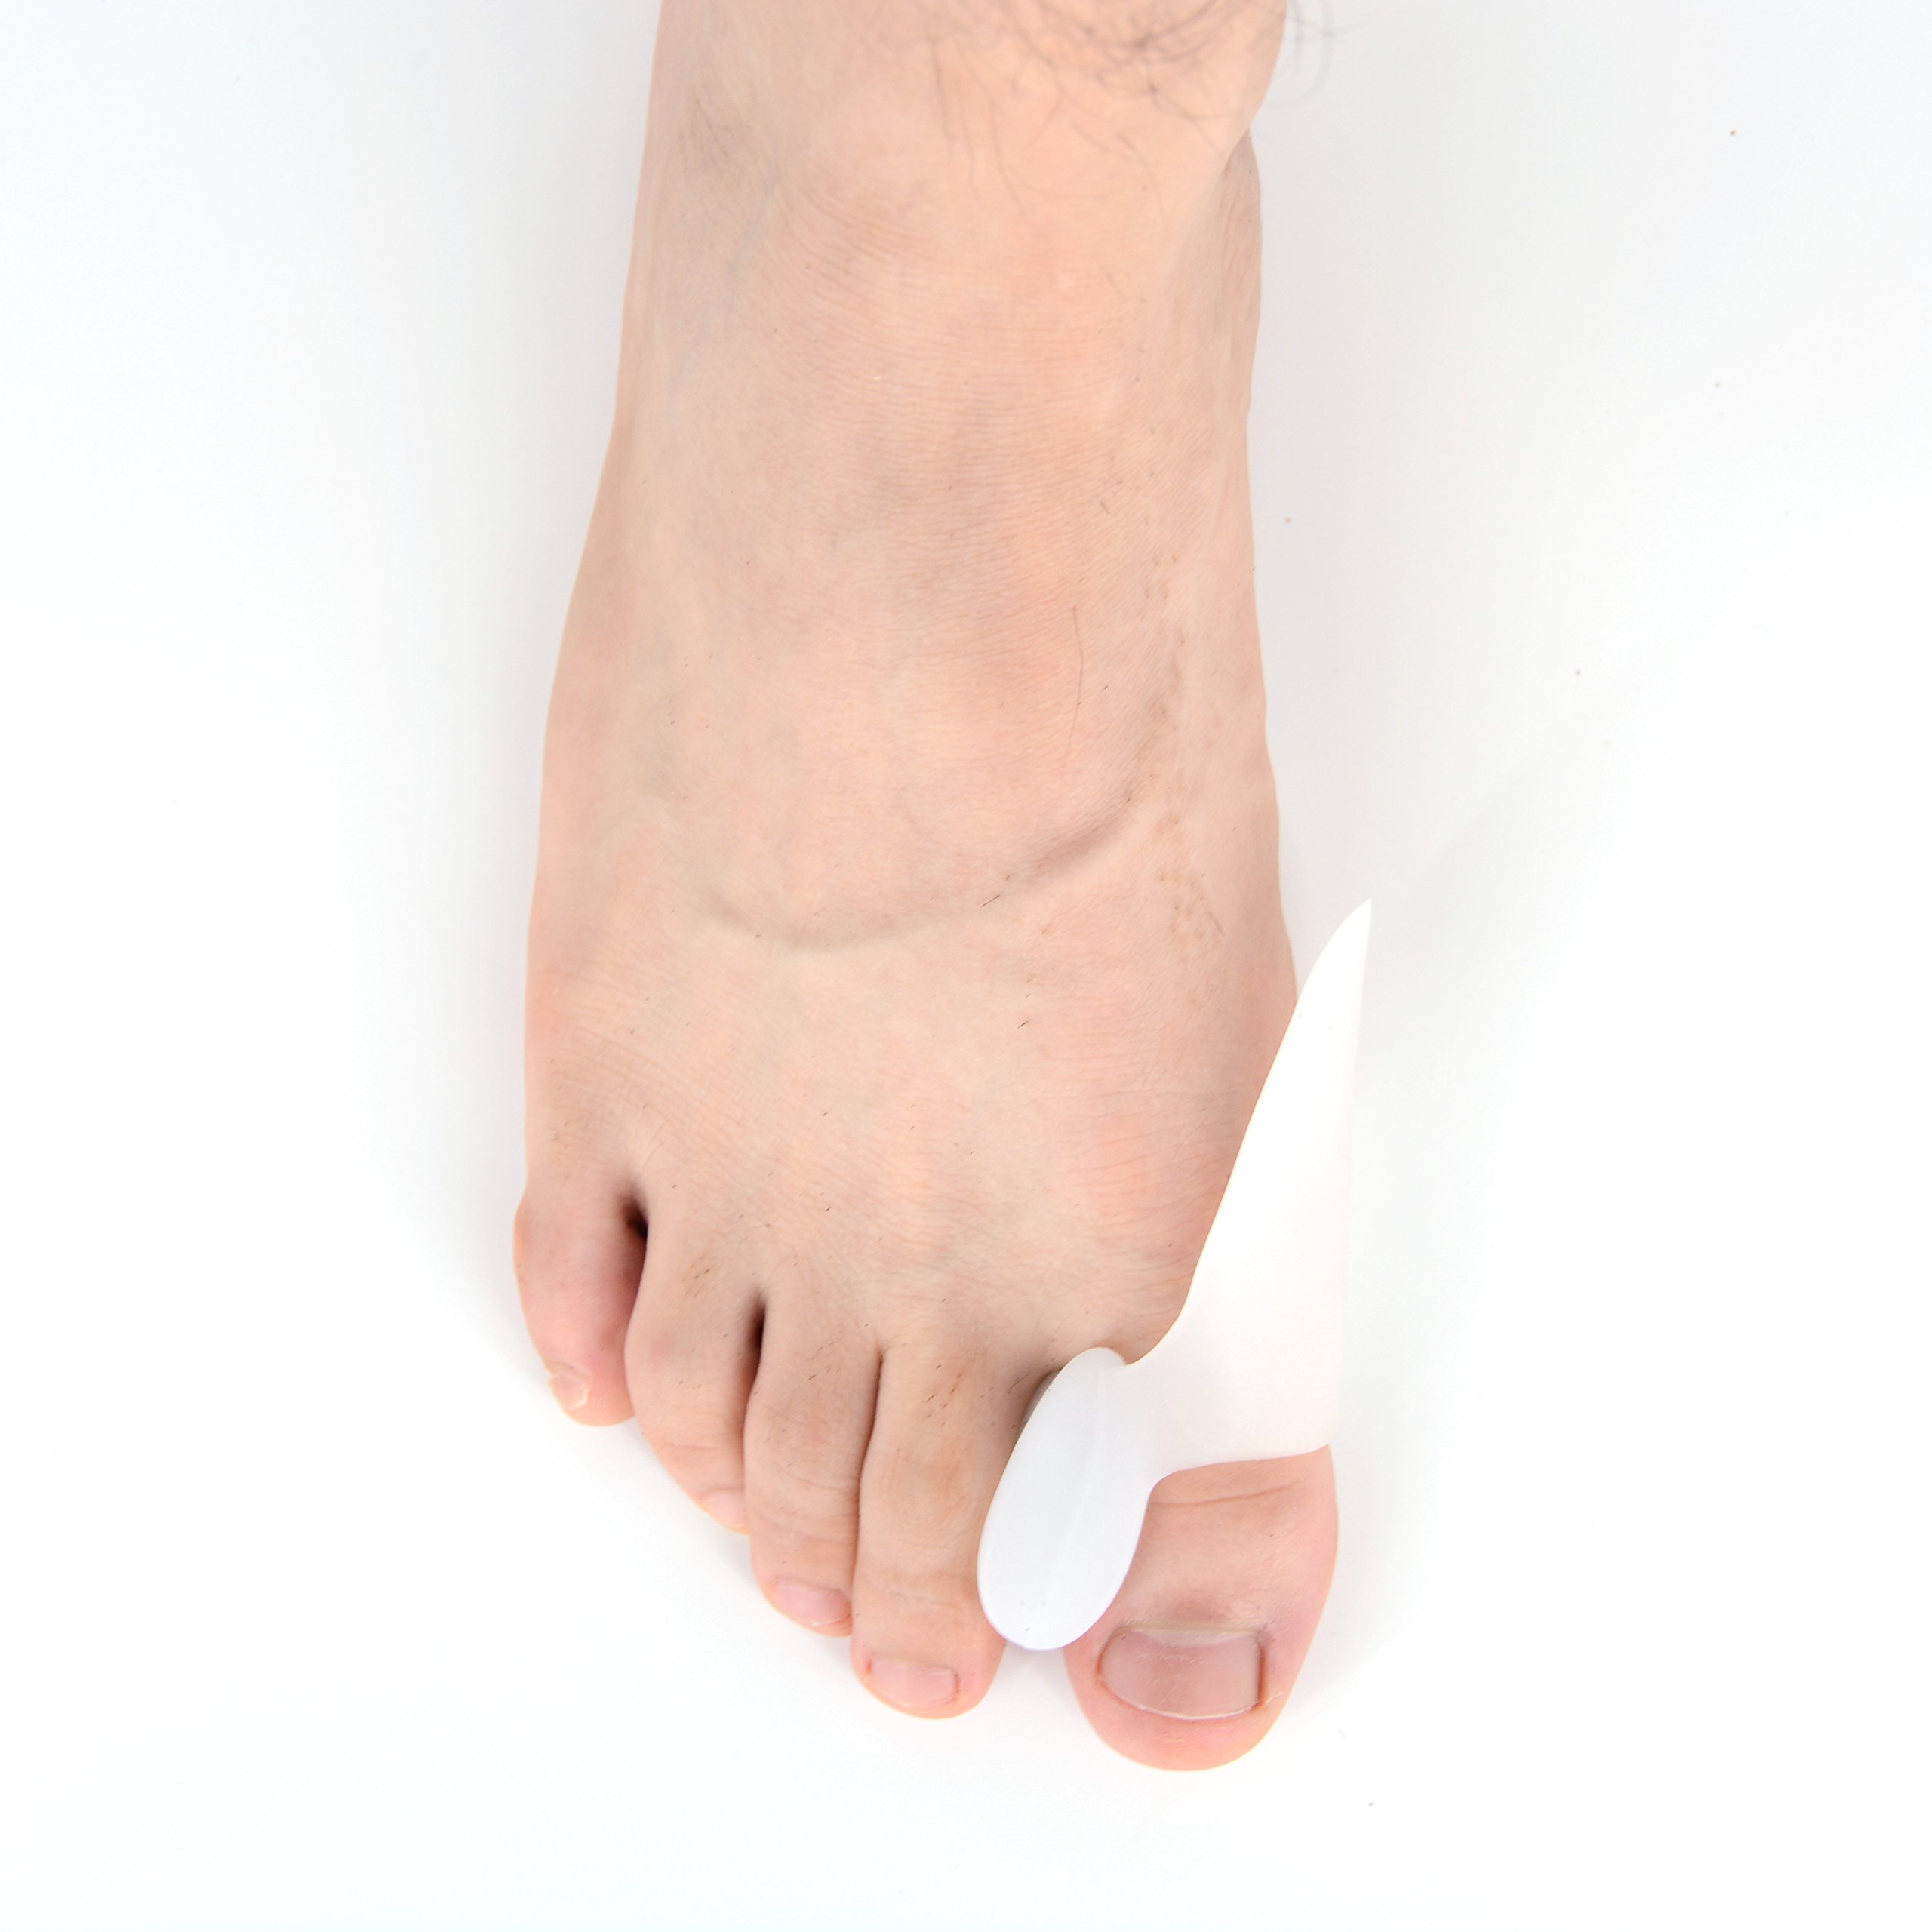 Dr.Koyama 2 Sets Rapid Bunion Pain Treatment Night Time Bunion Orthopedic Splints + Bunion Pad Toe Spacer Hallux Valgus Bunion Pads Medium by Dr.Koyama